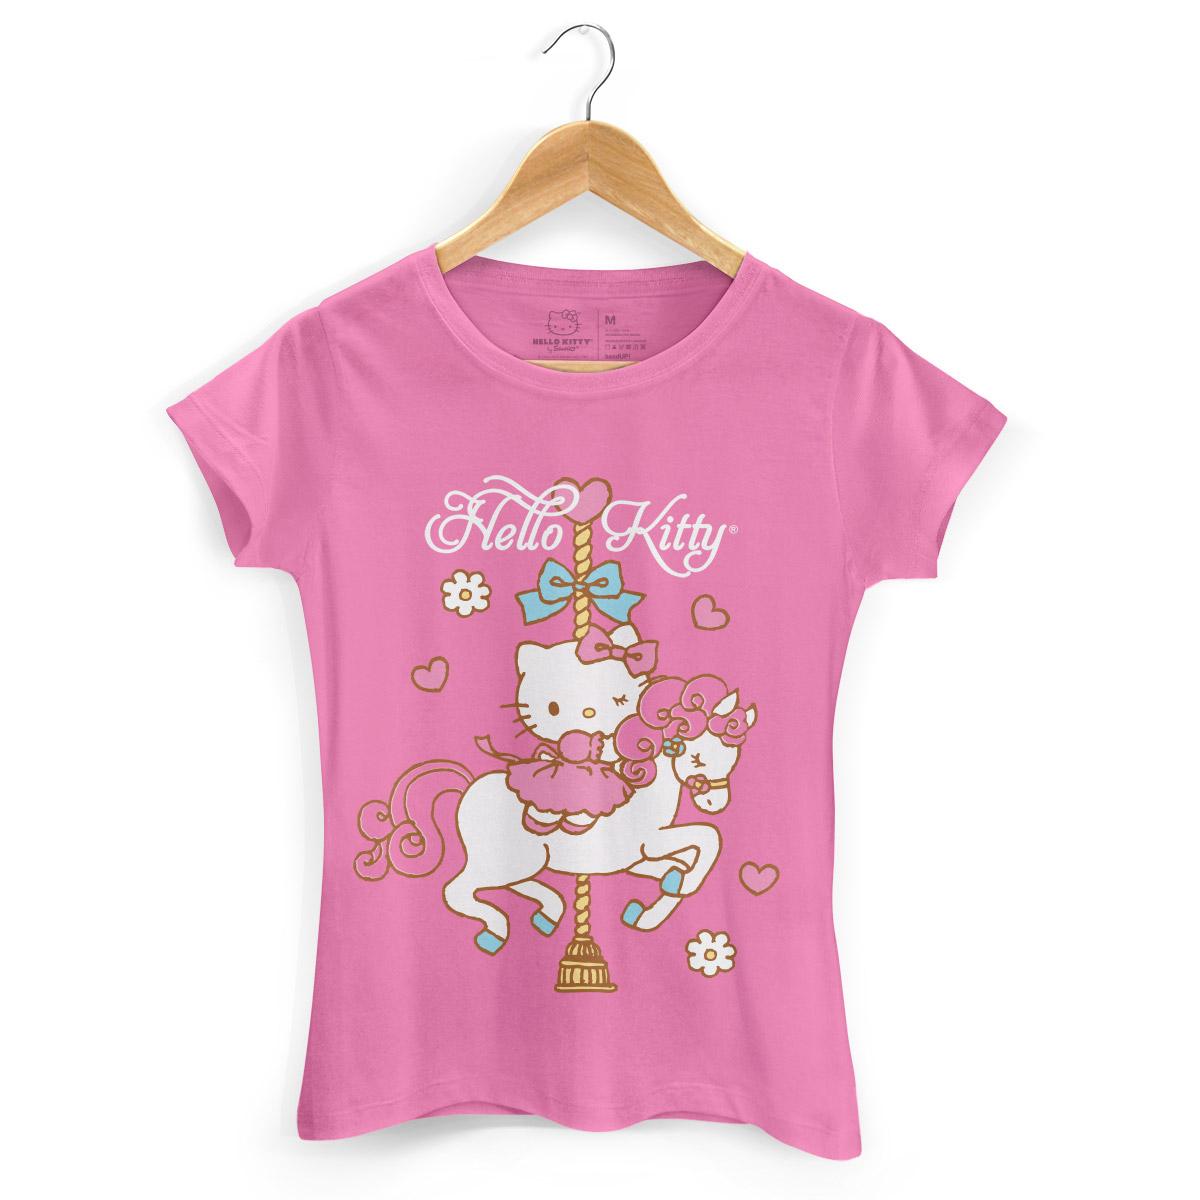 Camiseta Hello Kitty Carrossel